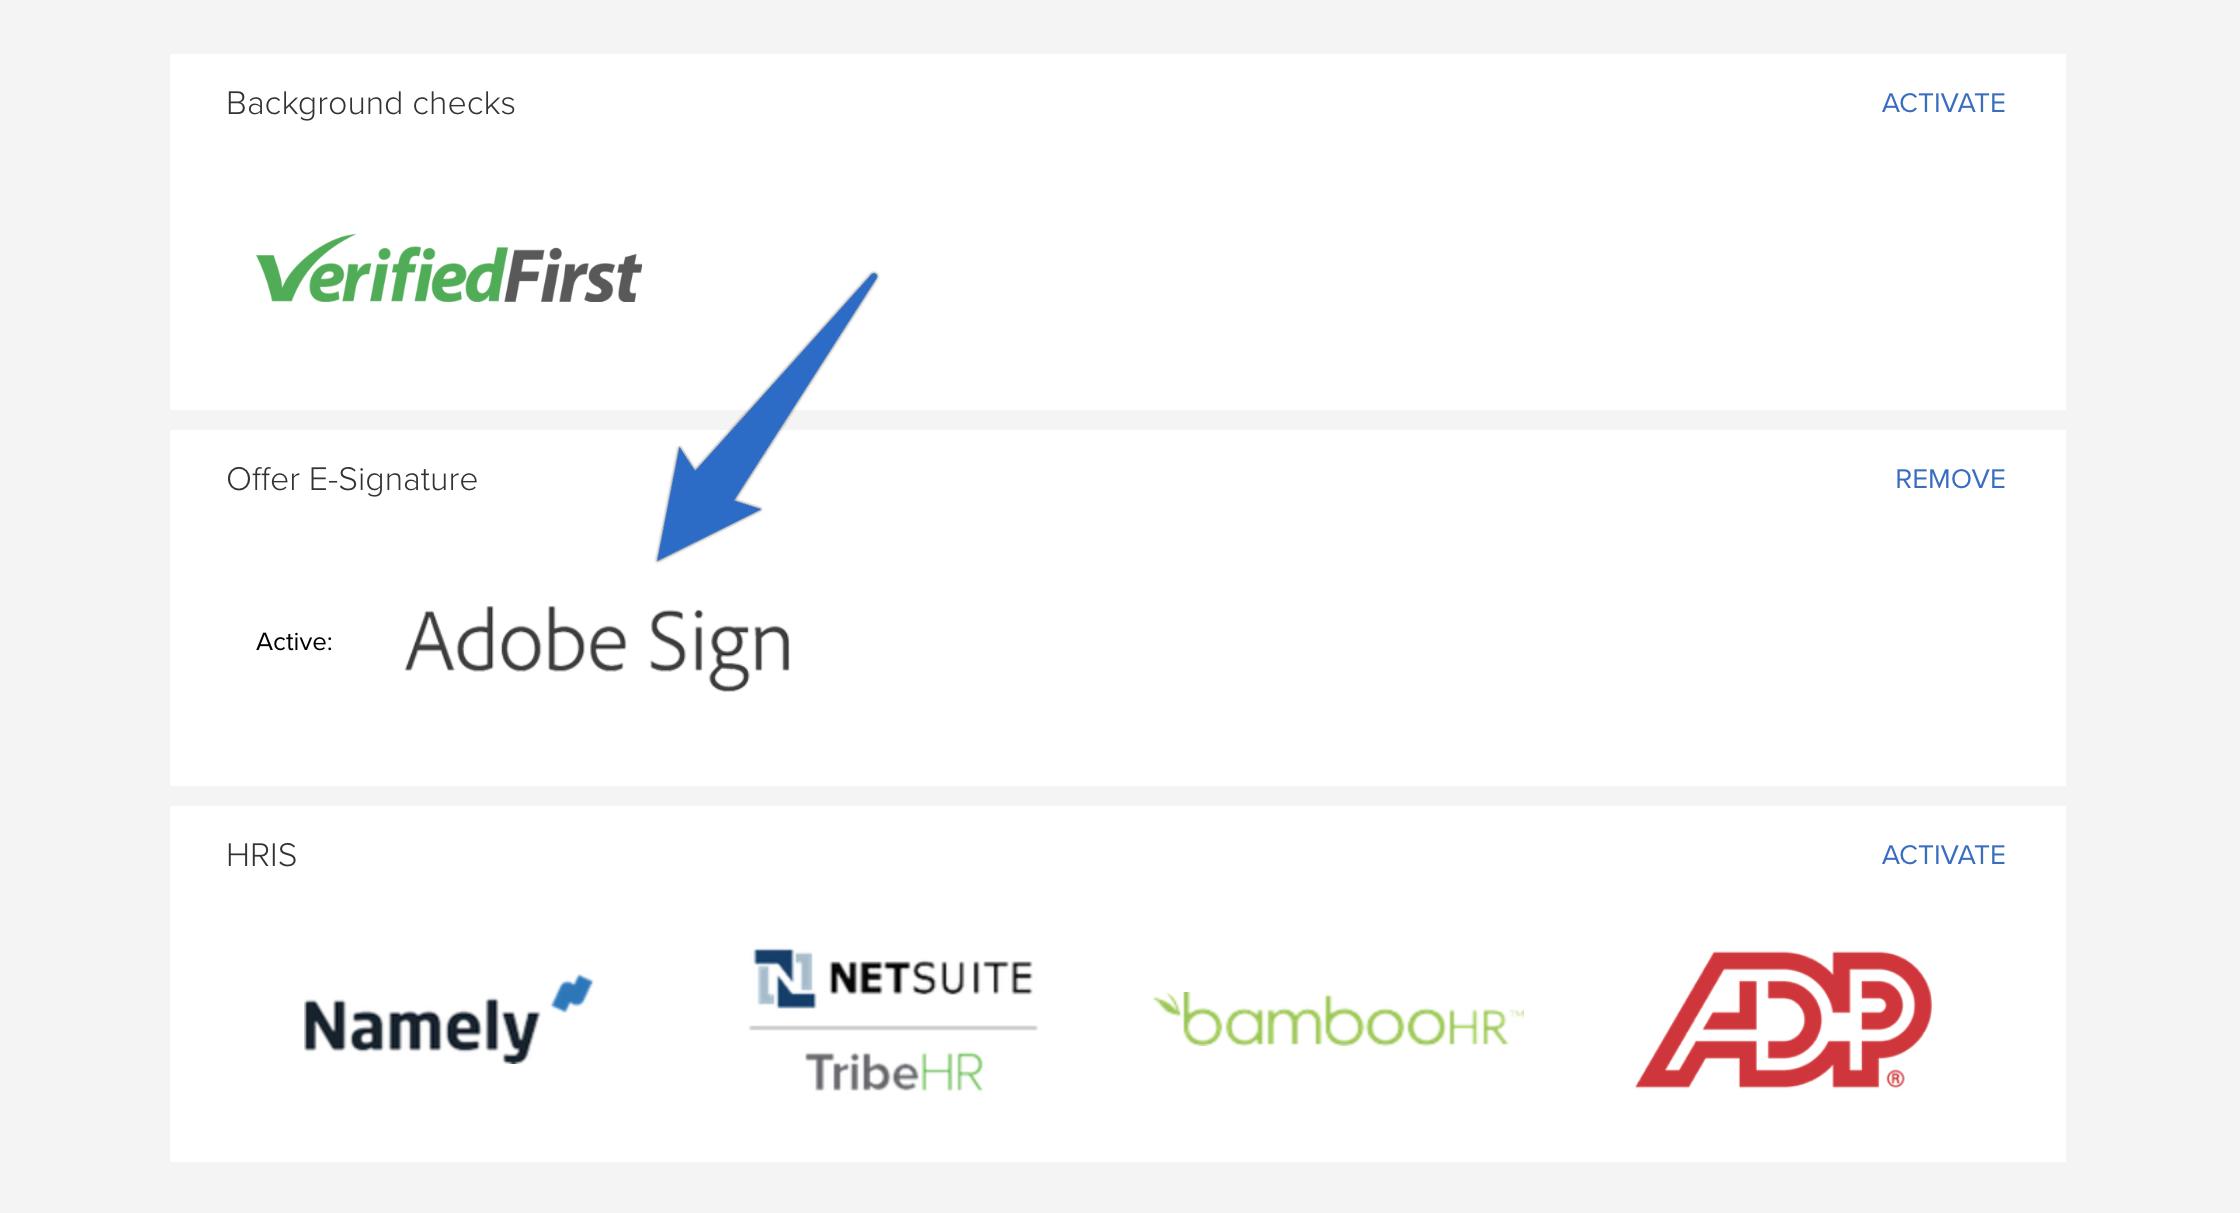 How do I use the Adobe Sign e-signature integration